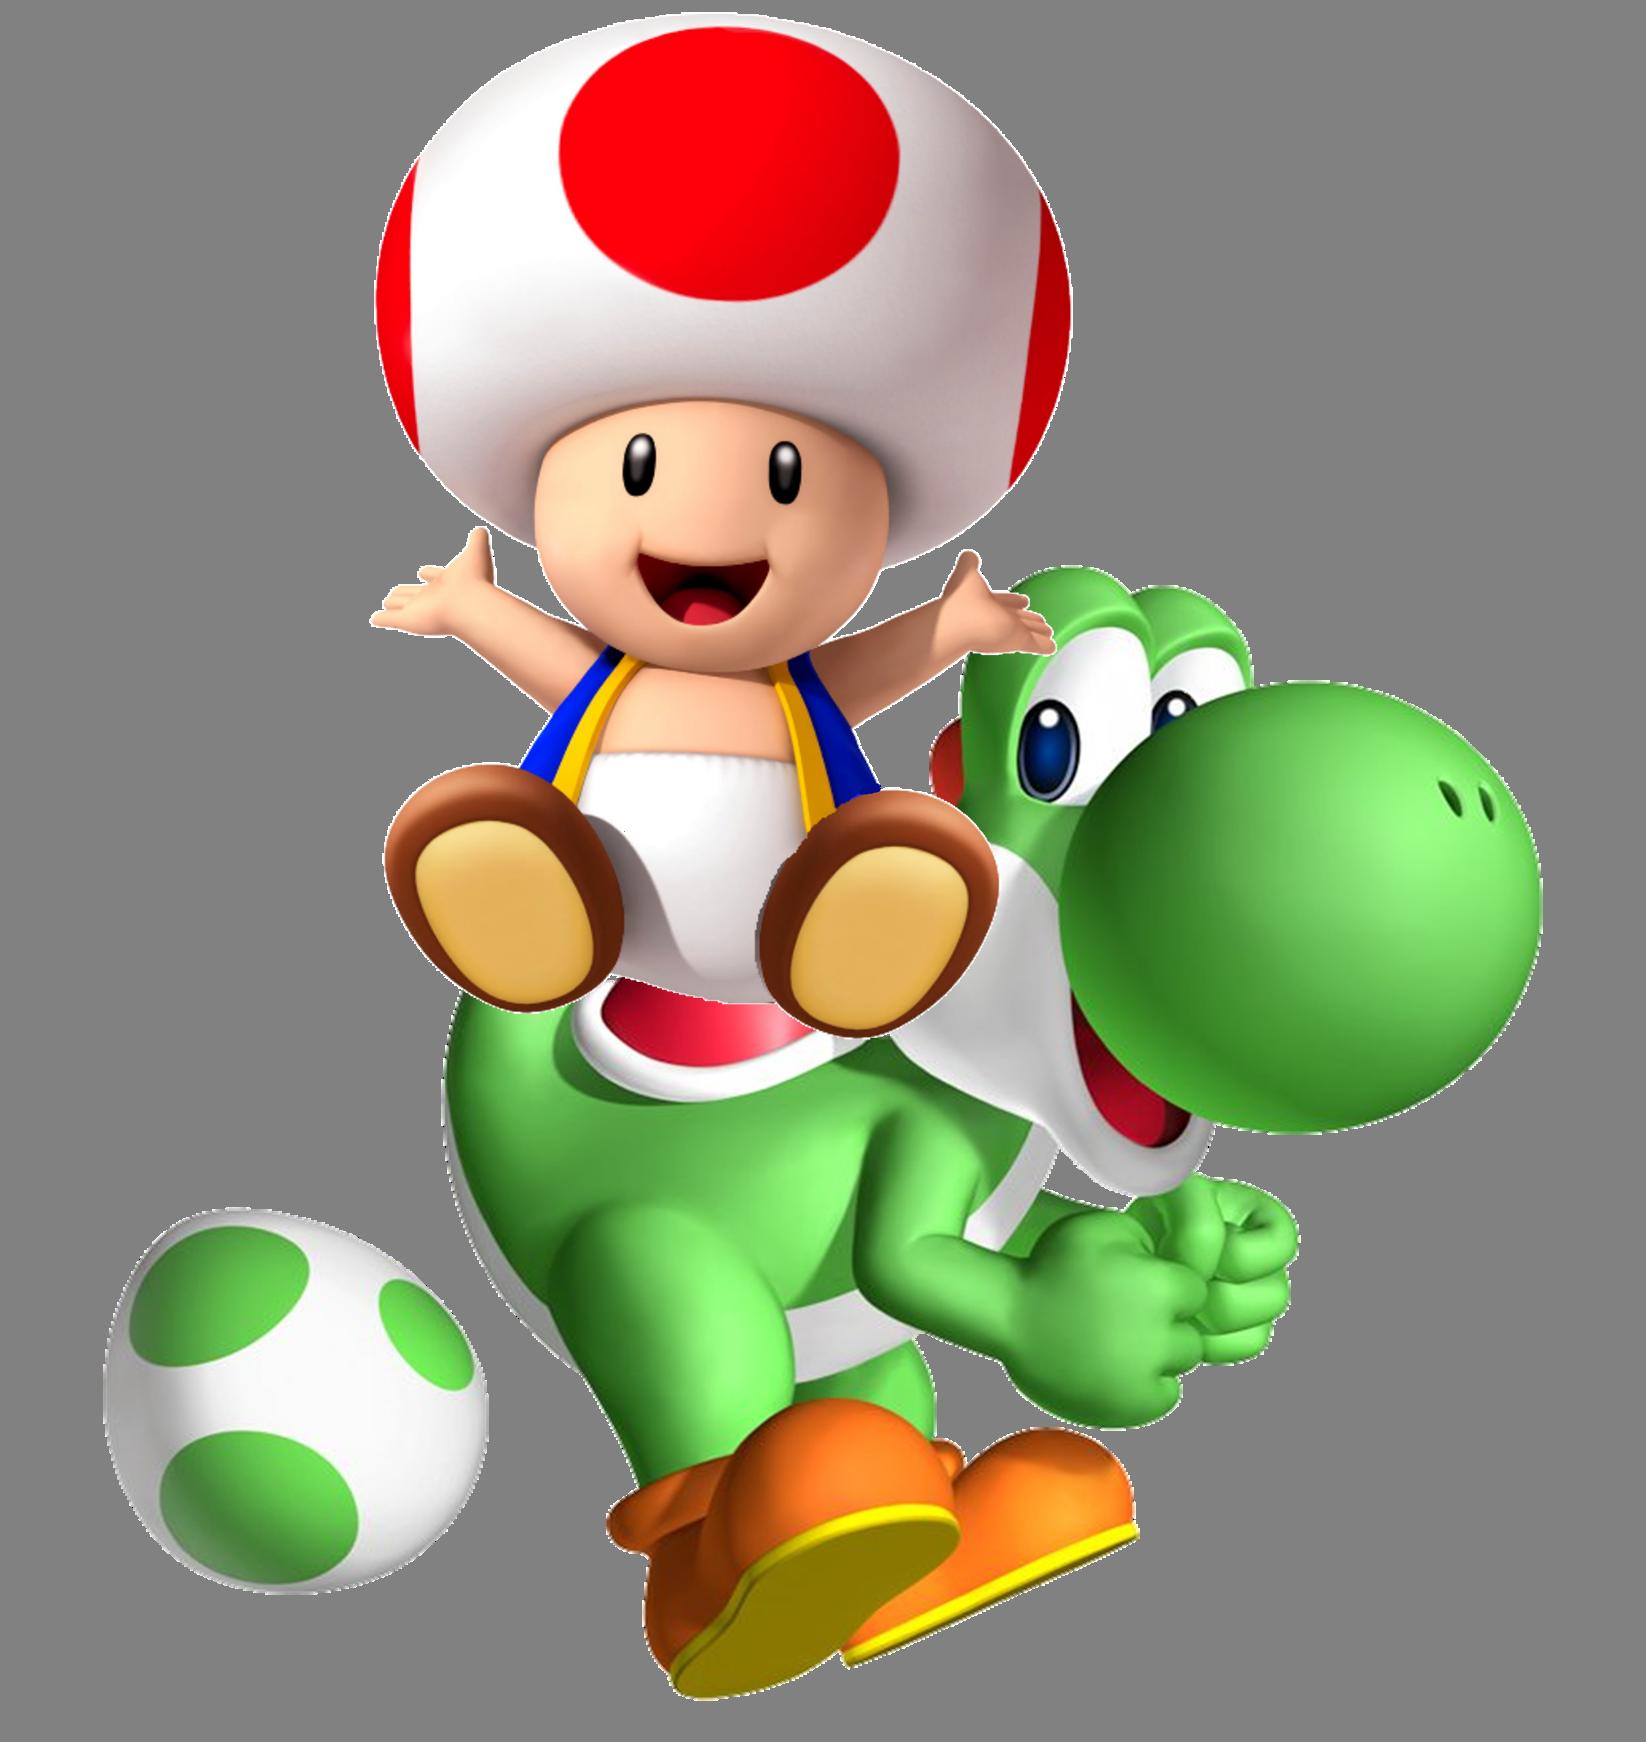 image toad in yoshi fantendo nintendo fanon wiki fandom powered by wikia